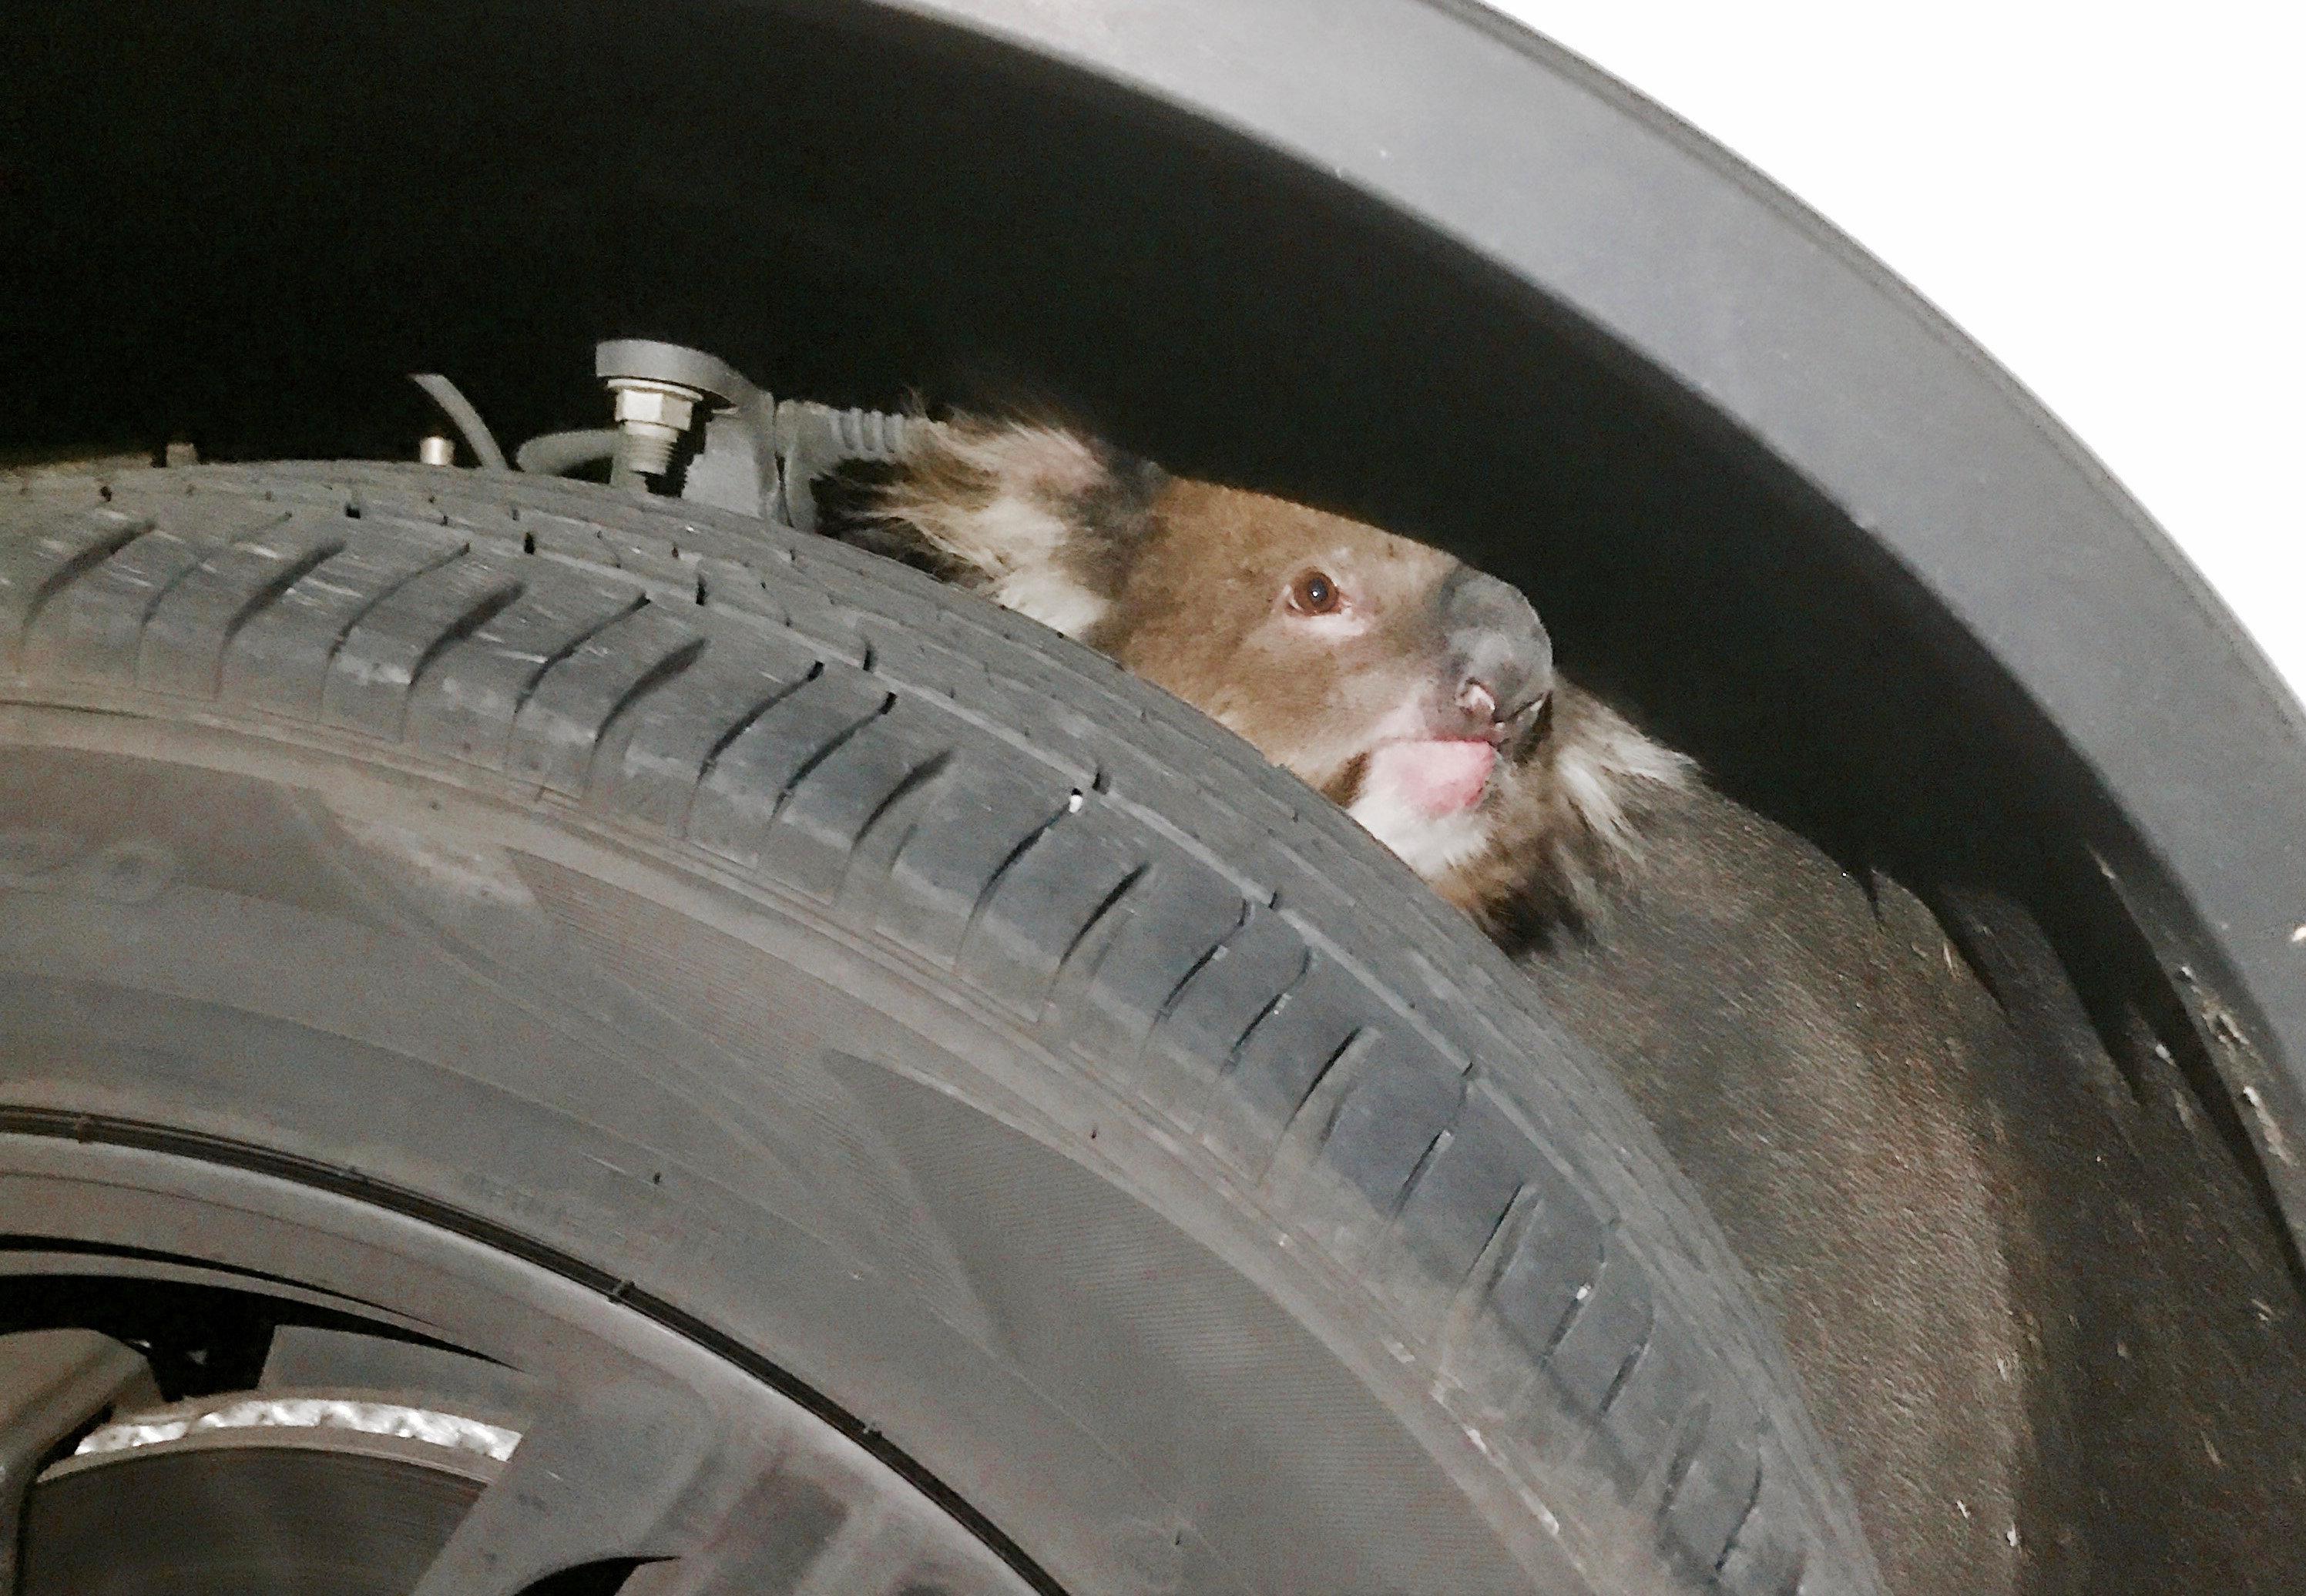 Koala survives 16-km road trip trapped under four wheel drive vehicle in Australia